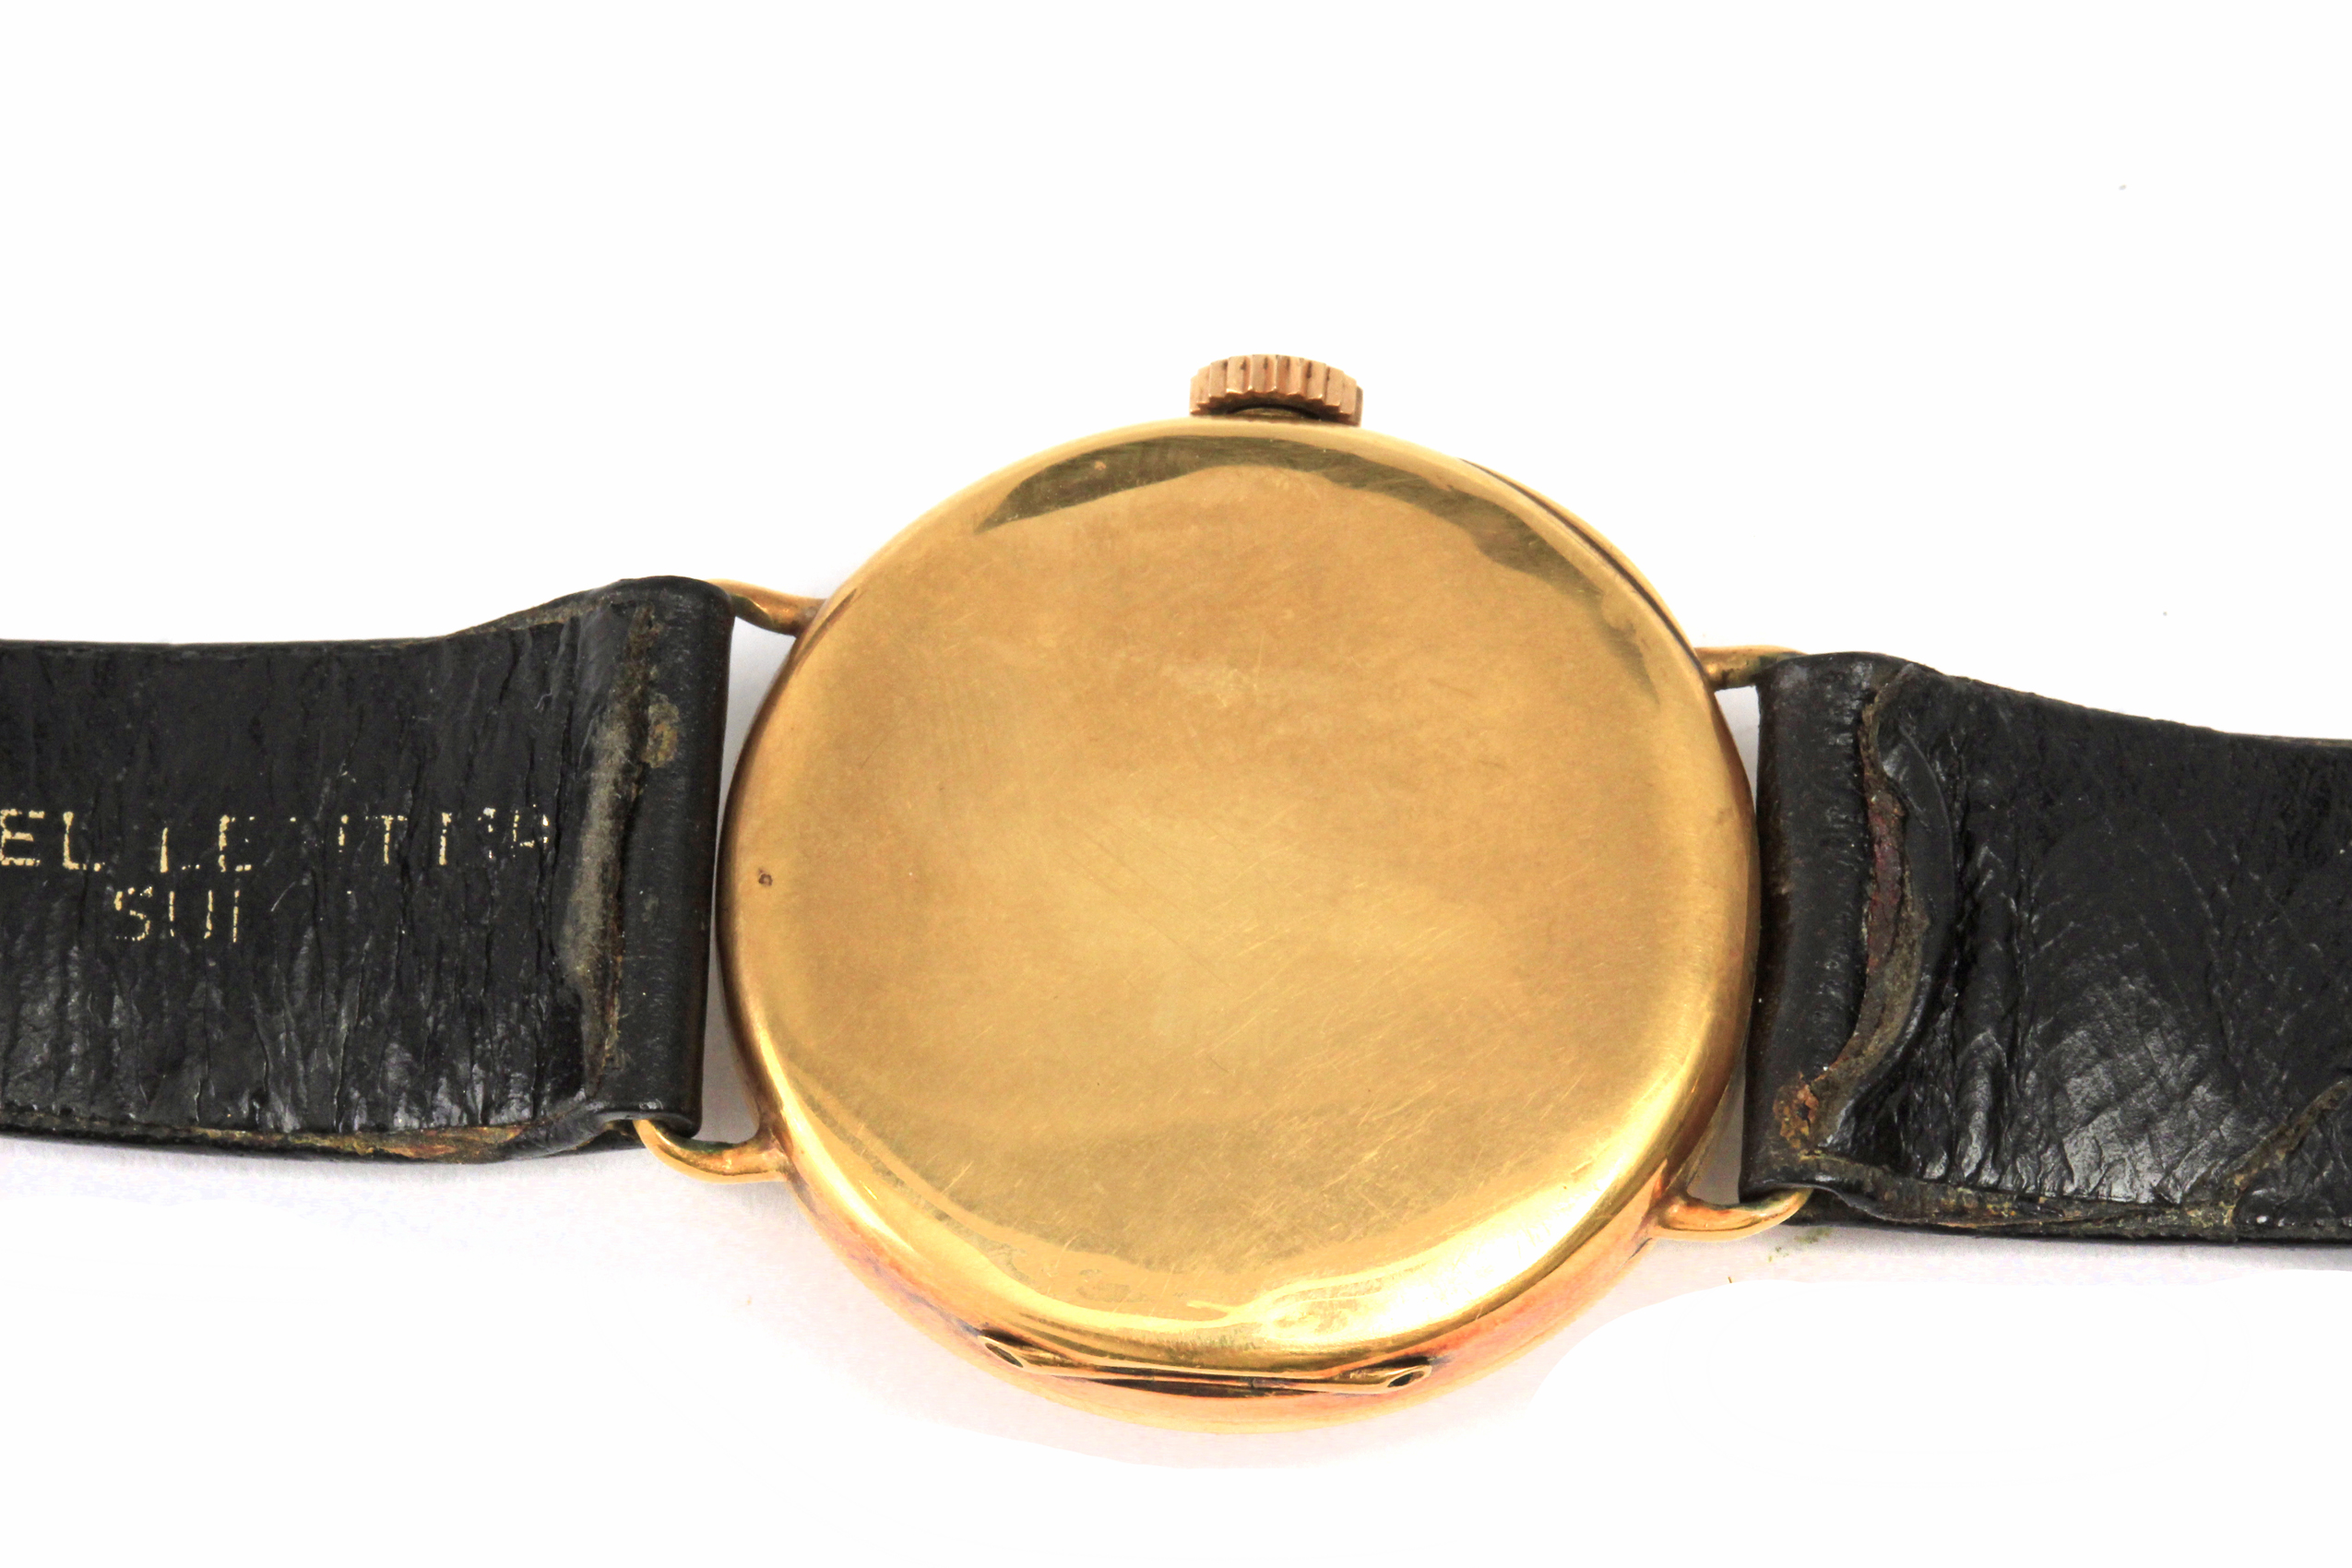 Lot 75 - Tissot. A wrist watch circa 1950 in 18 k. yellow gold